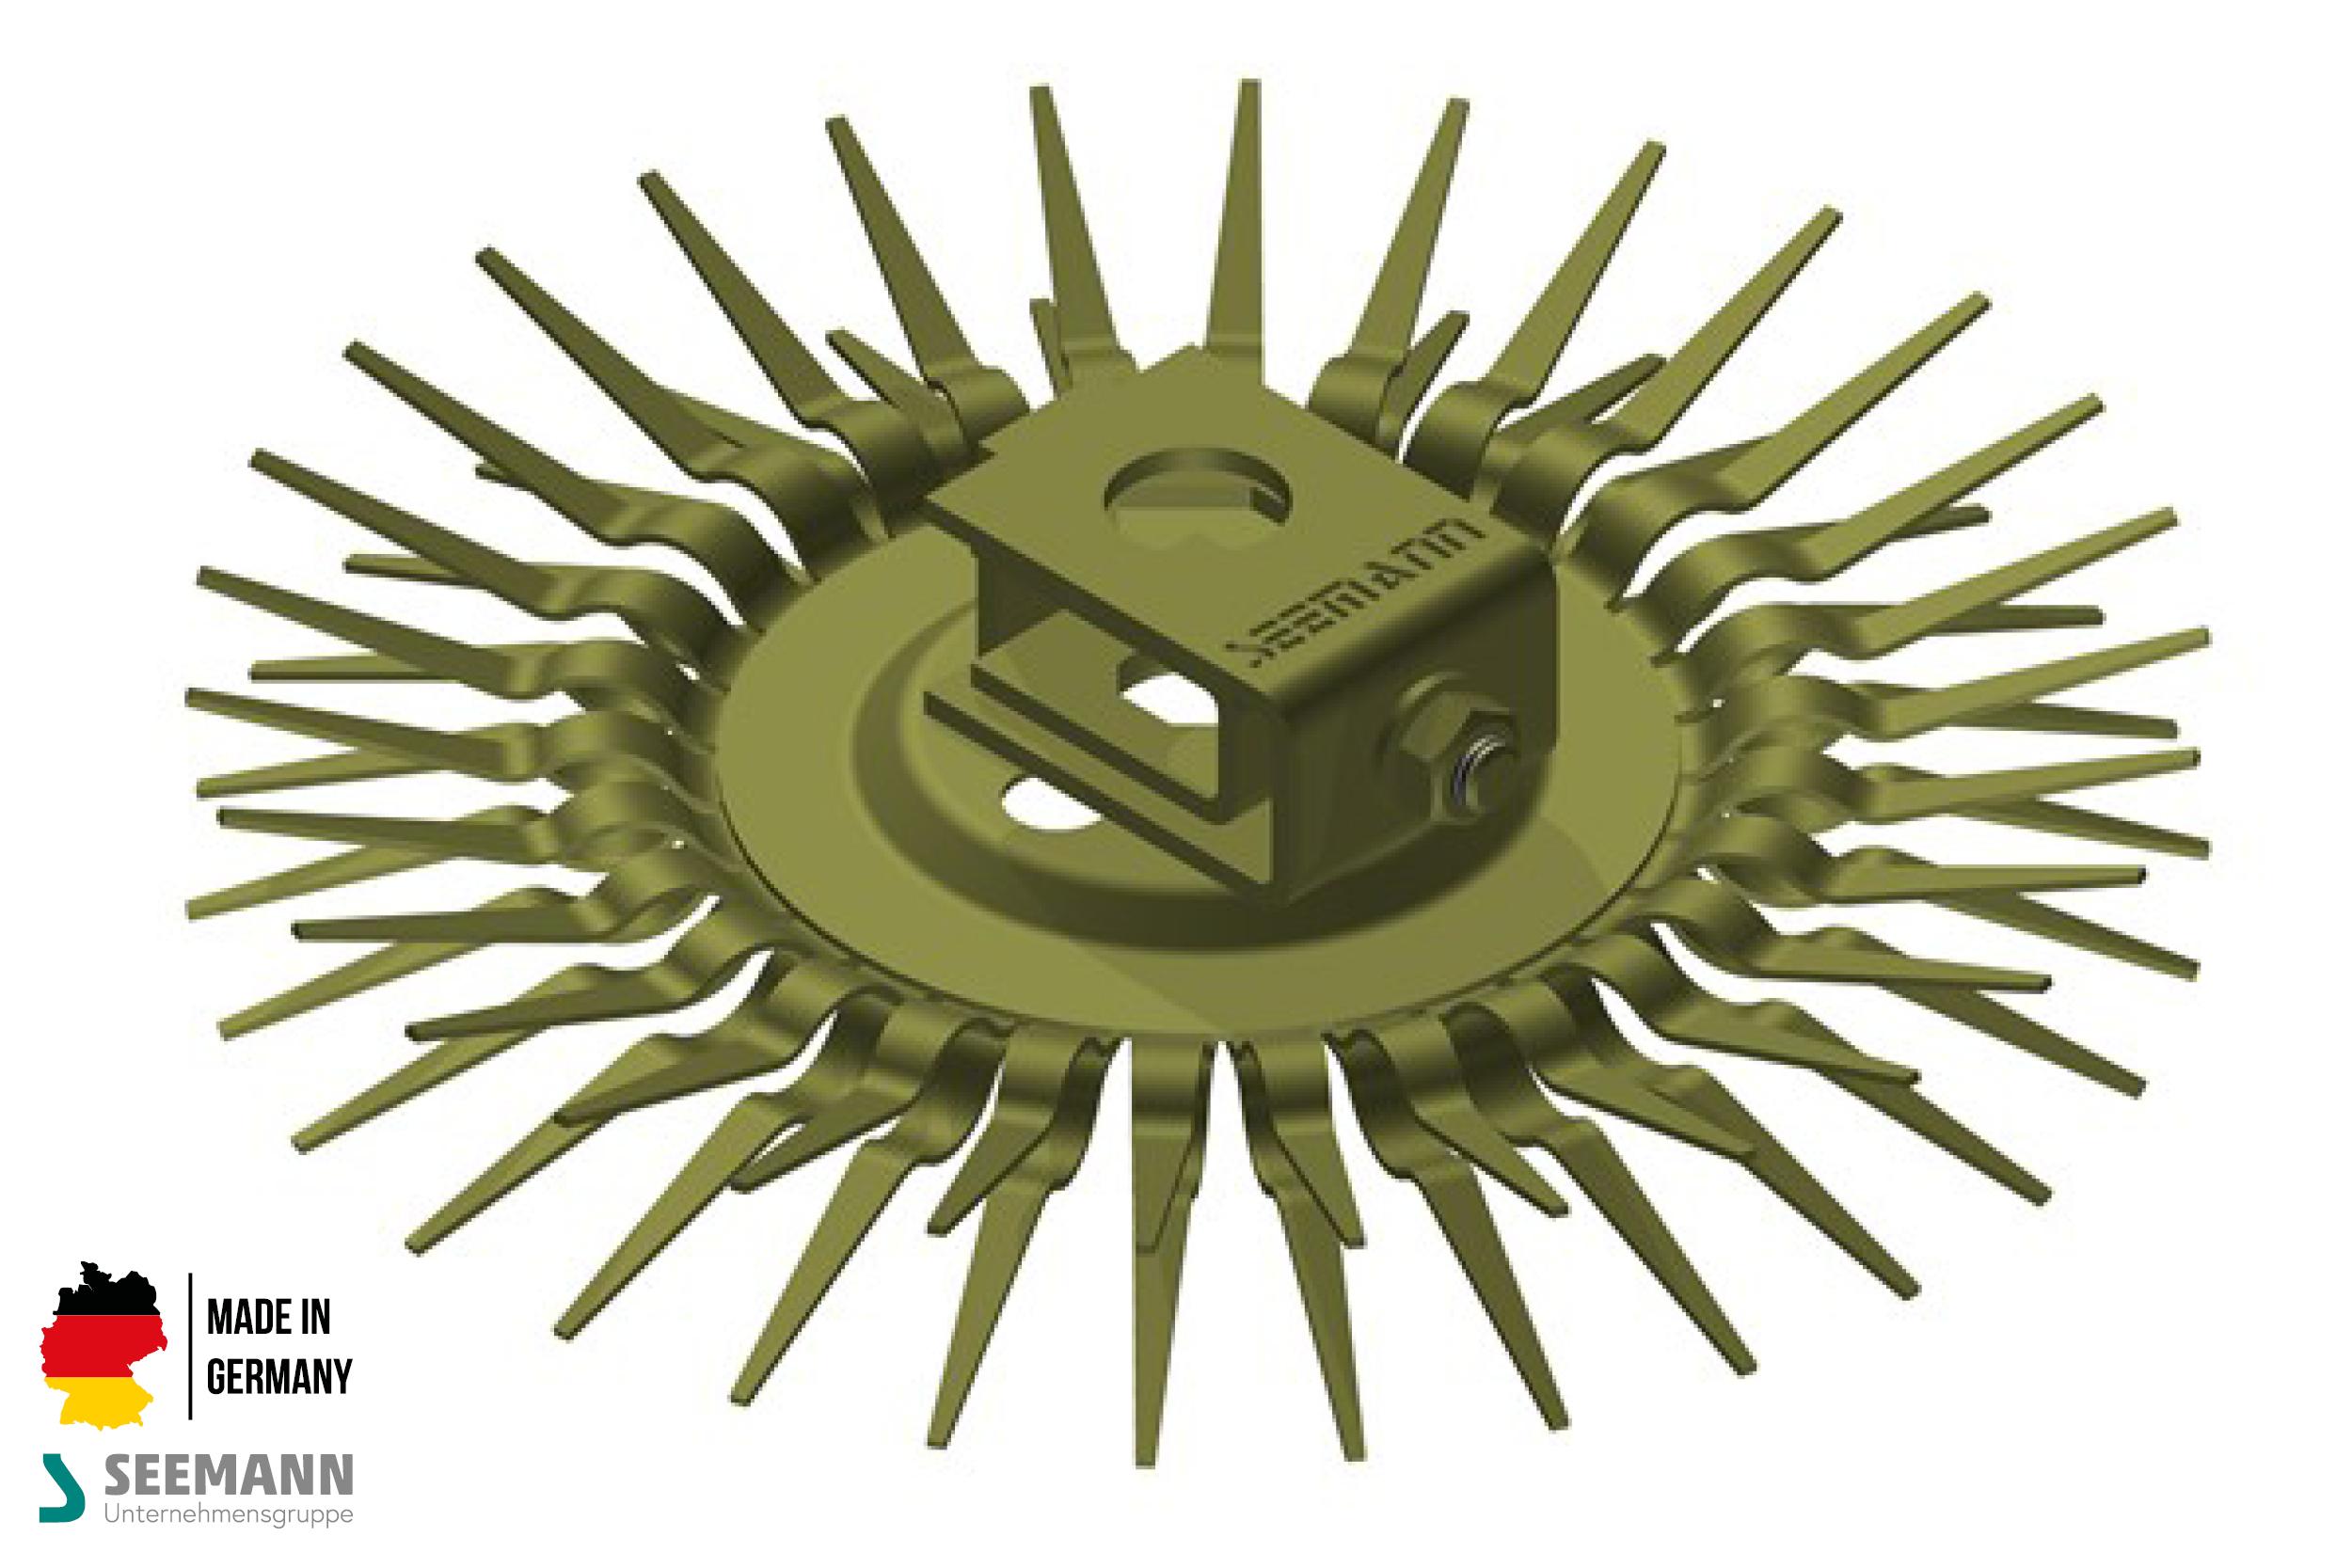 Titan-Klammerteller mit 30 Kontakten